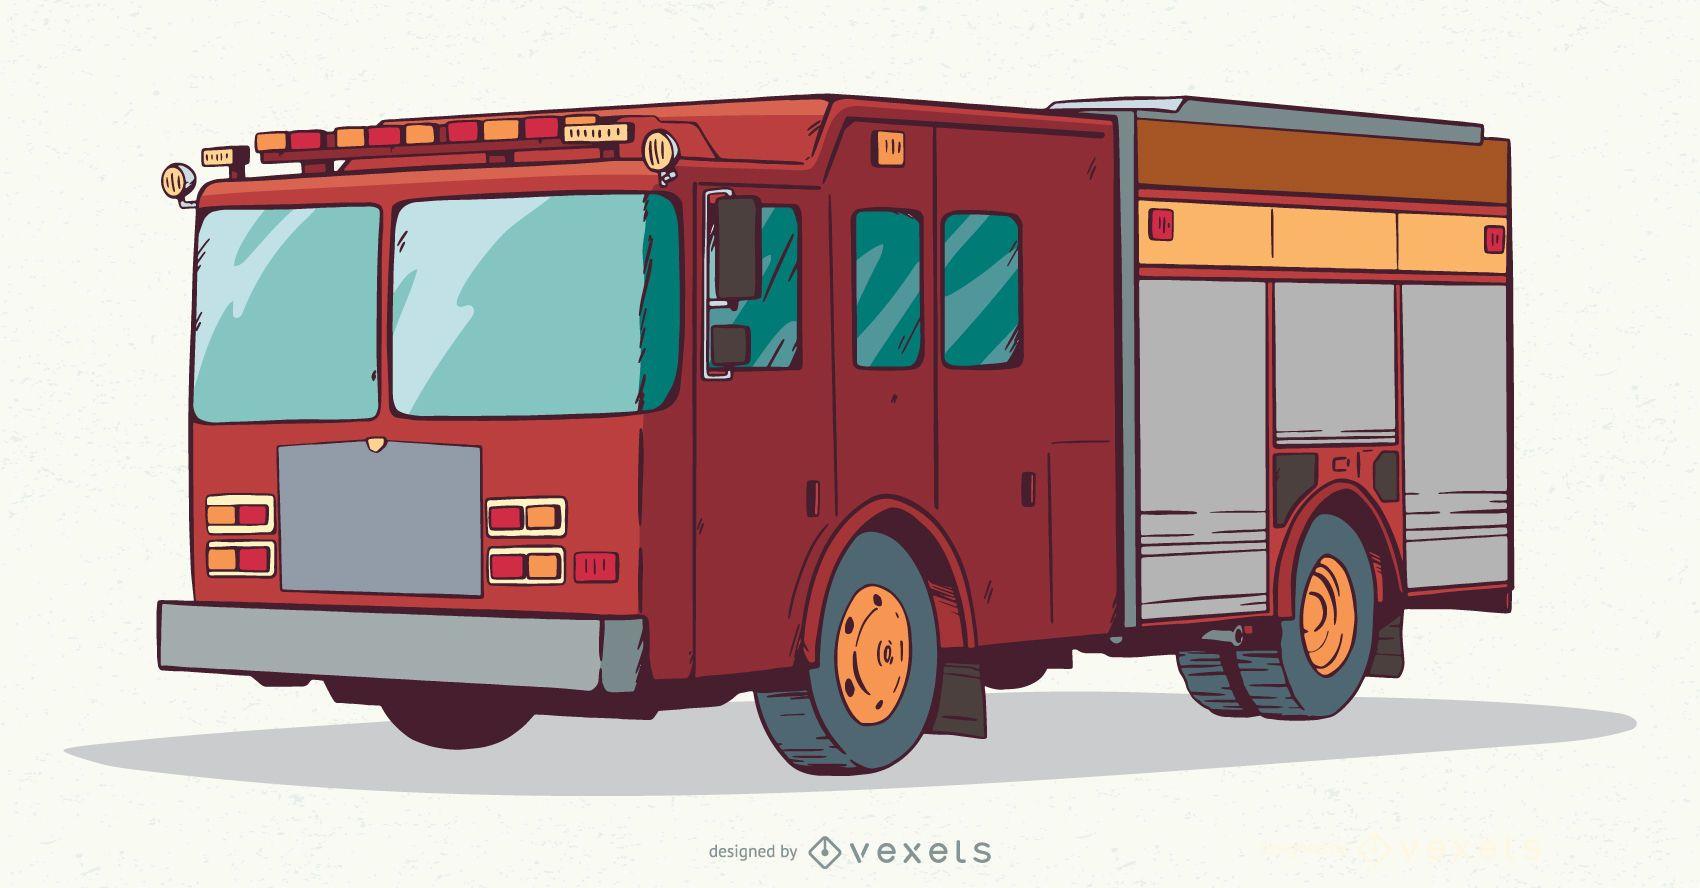 Fire truck illustration design